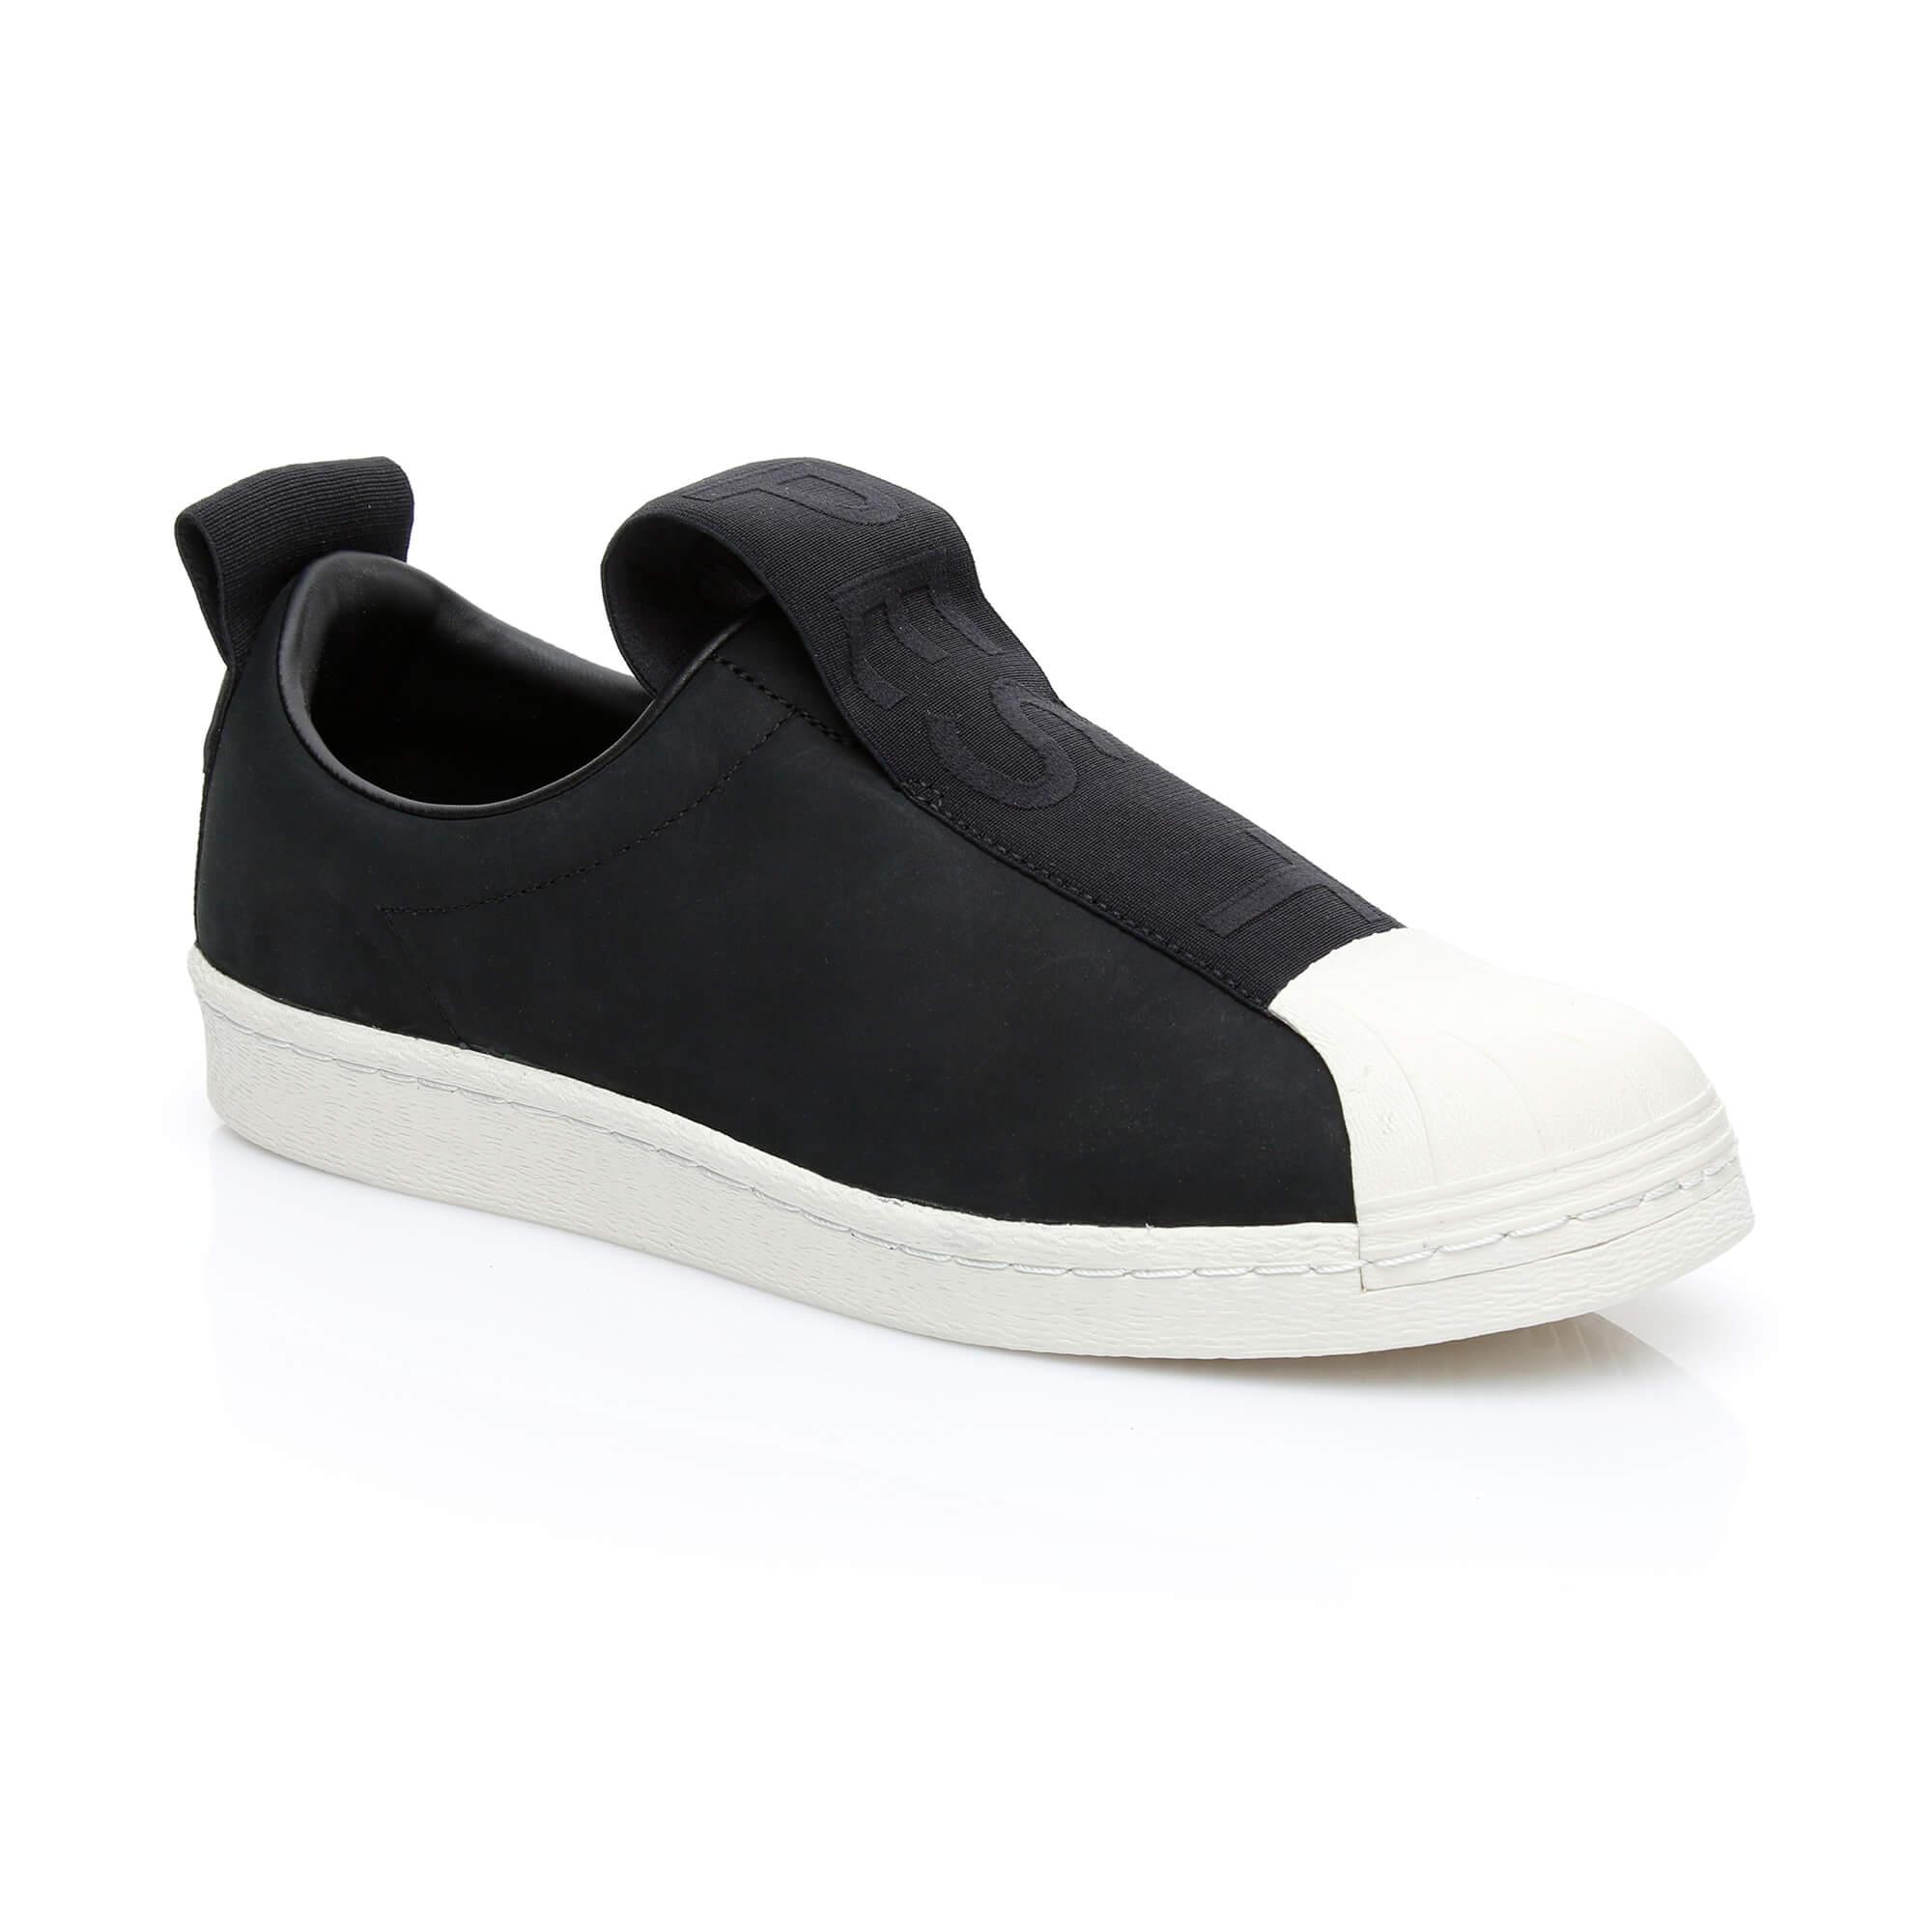 Adidas Superstar Slip on Kadın Siyah Sneaker